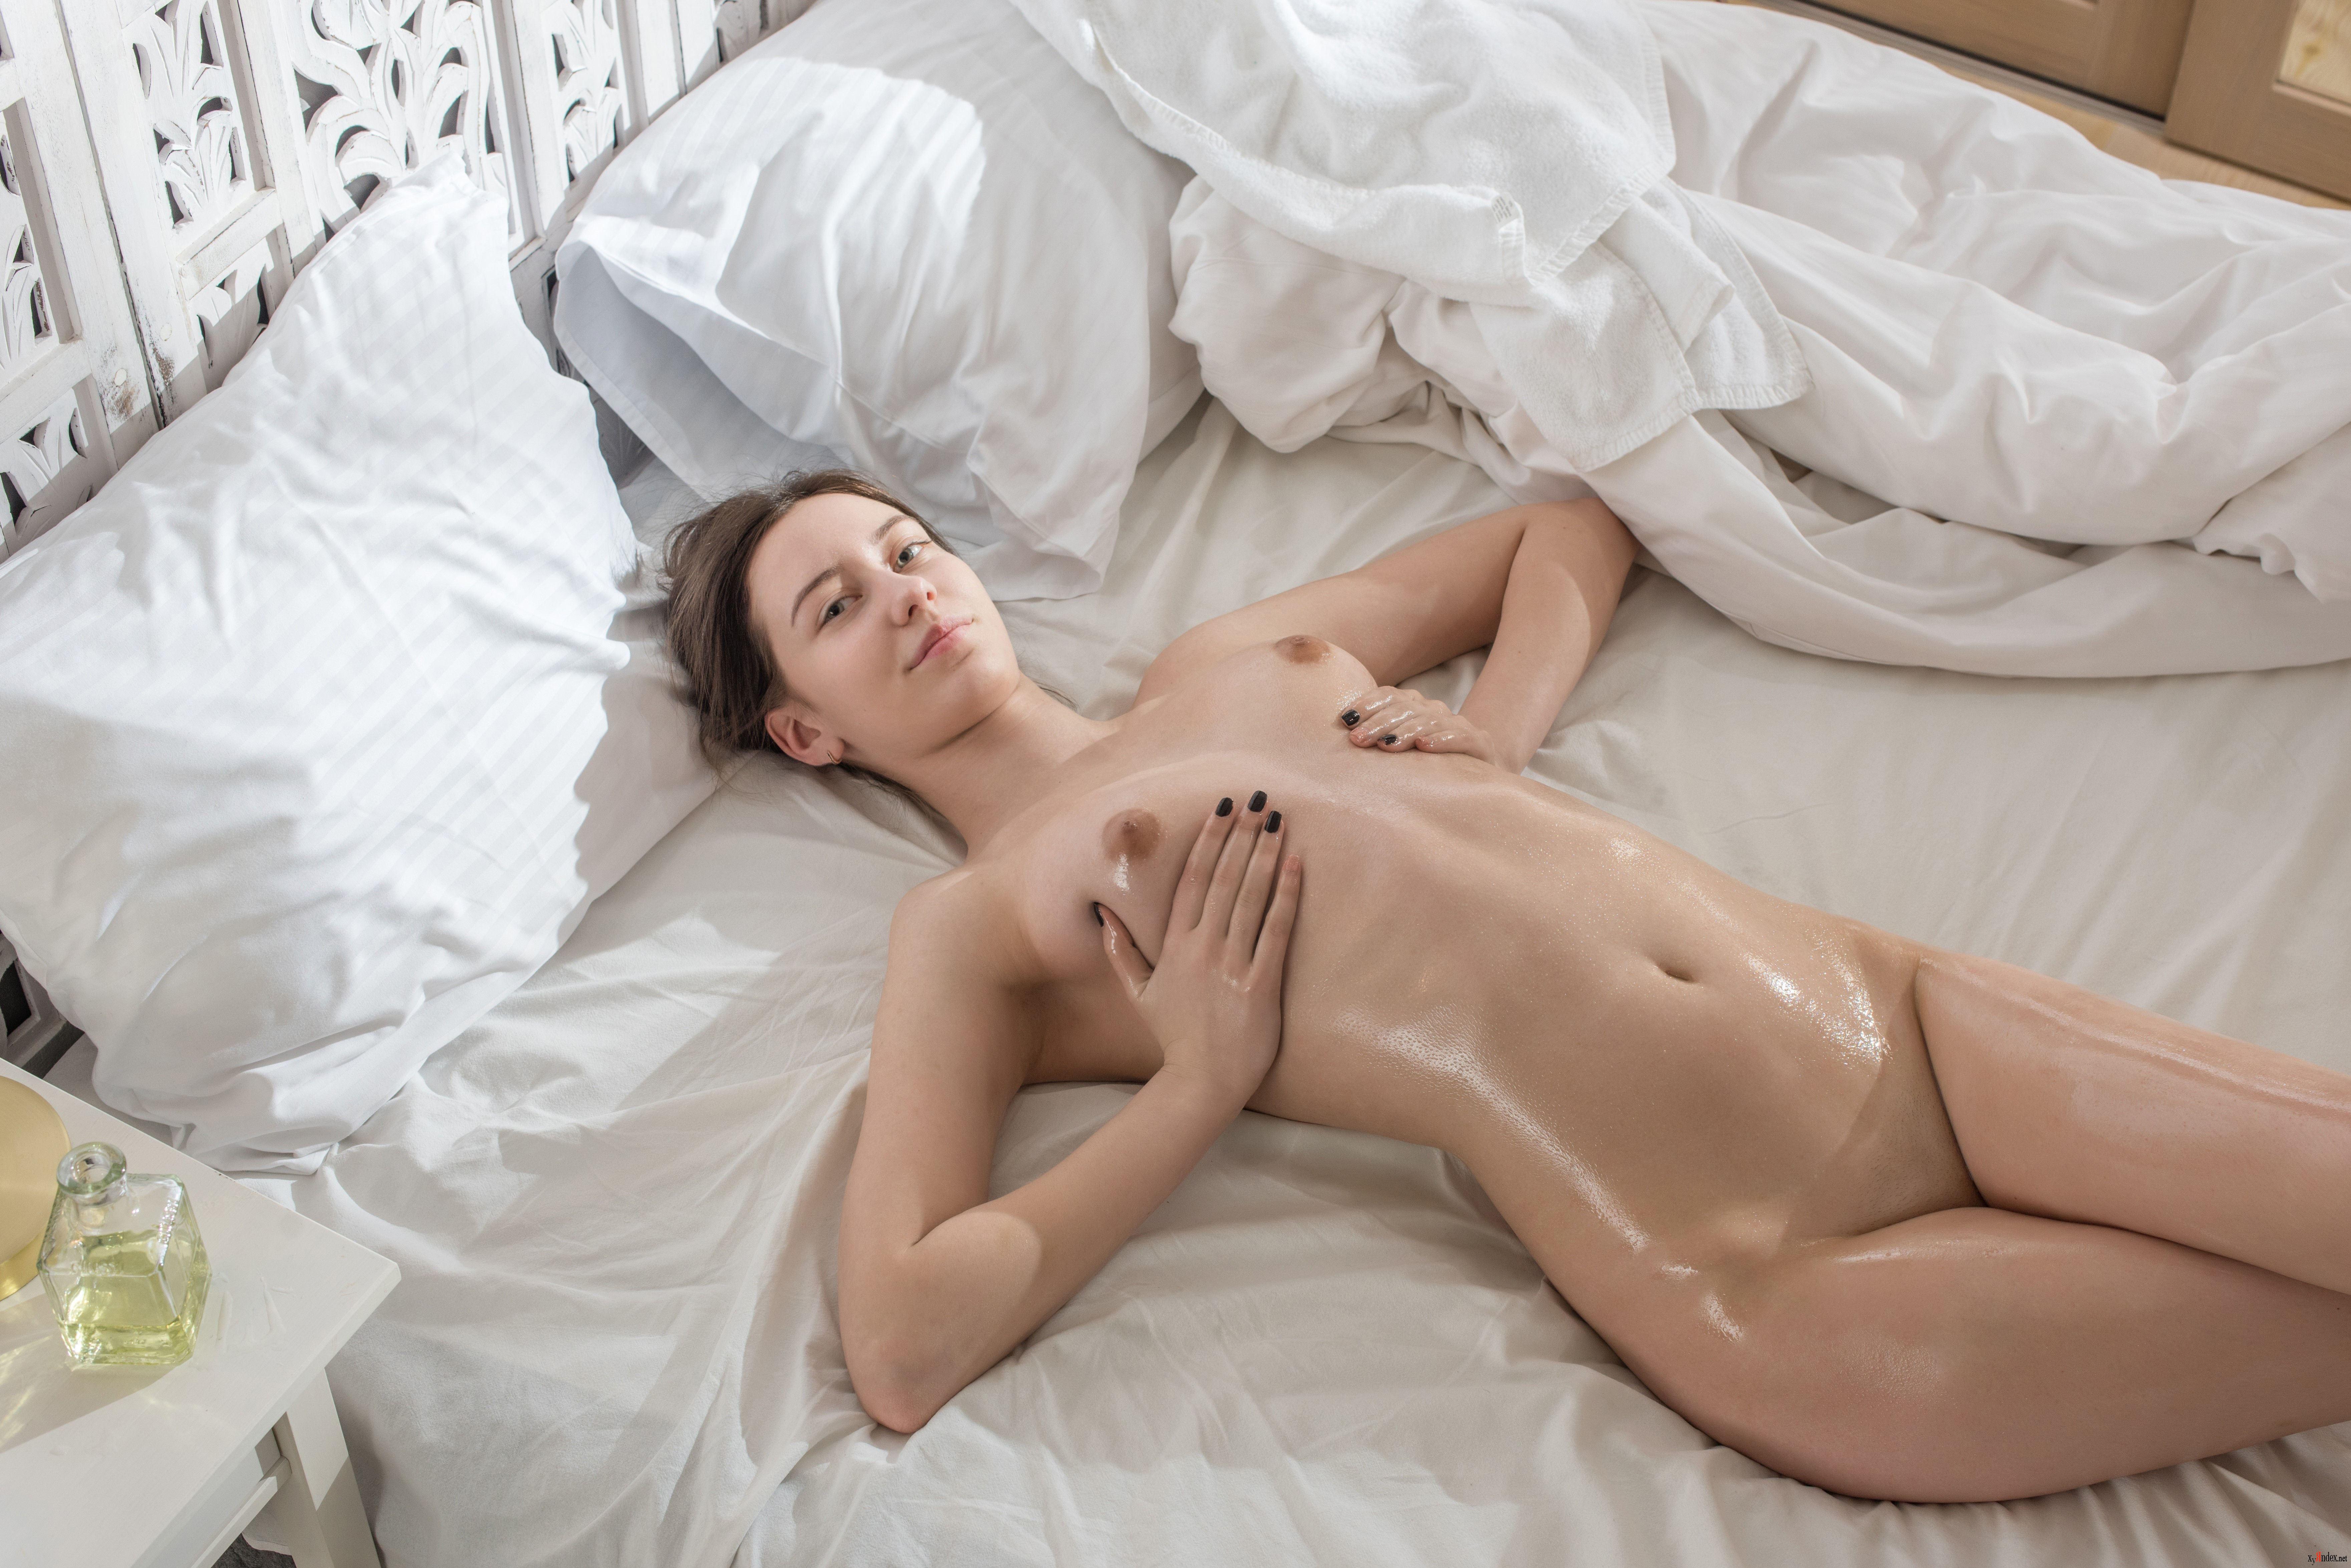 Hot hazel bond in lingerie